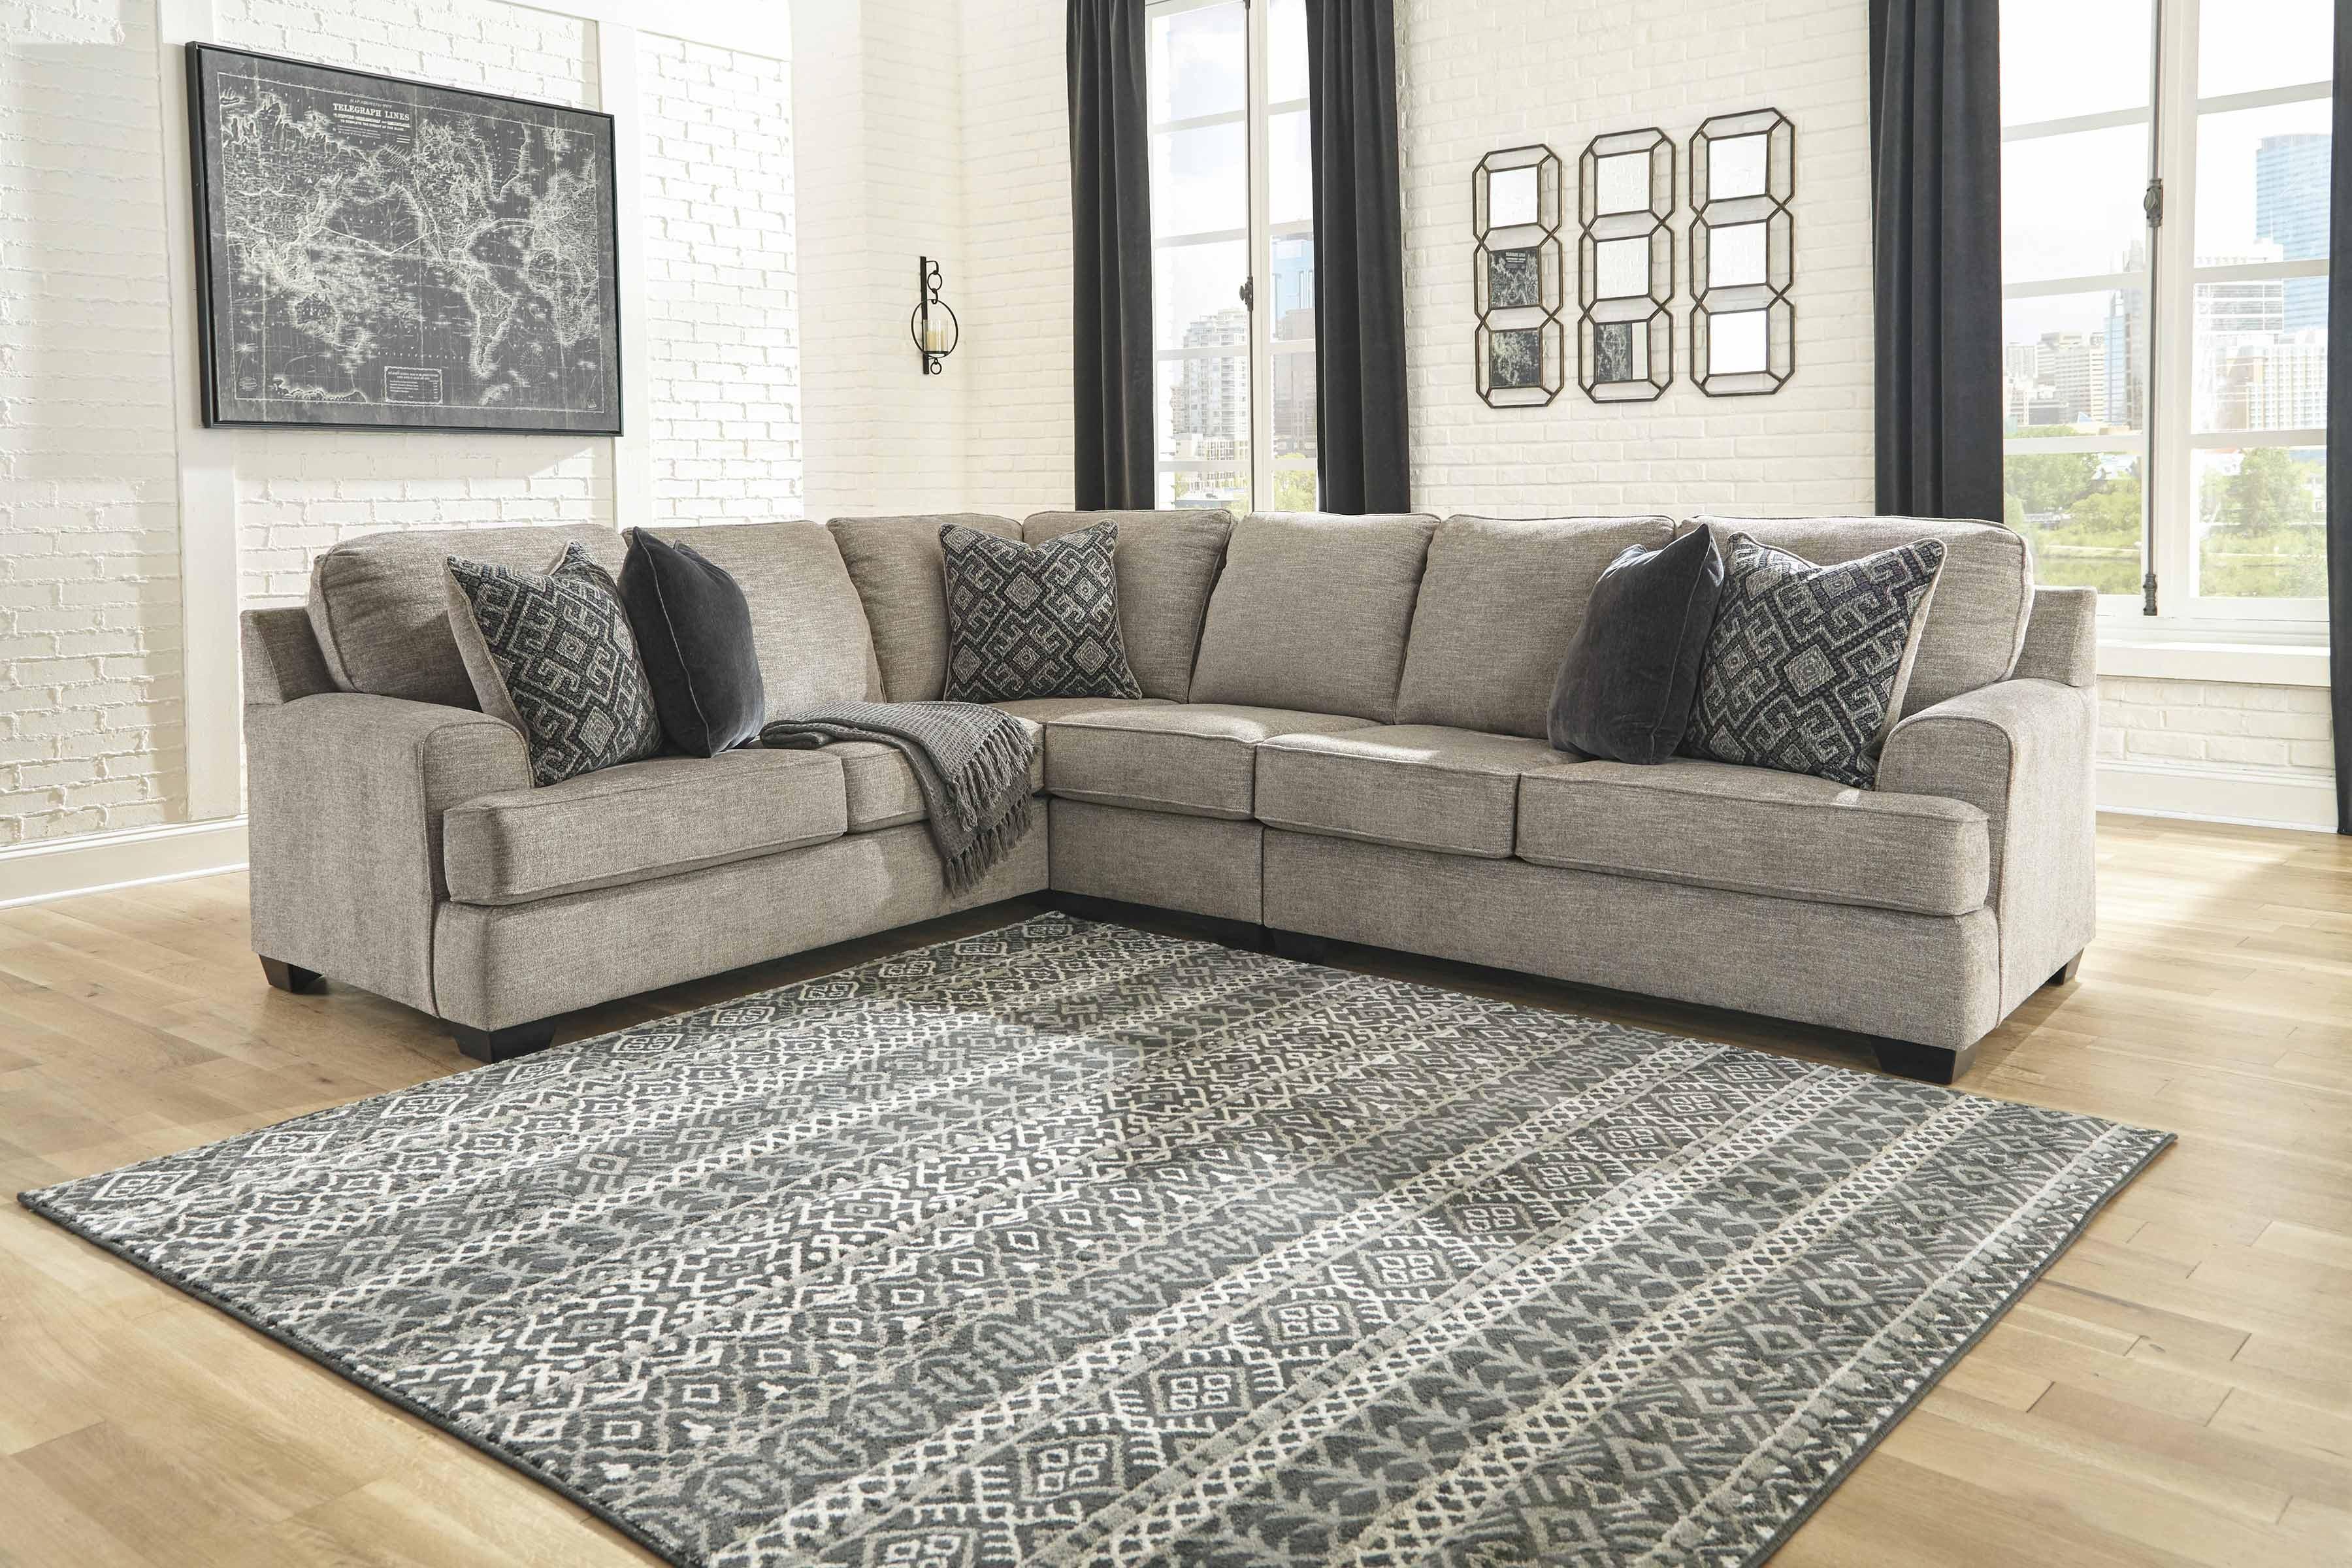 Ashley Furniture Bovarian Laf Sectional In Stone in Ashley Furniture Dallas Tx